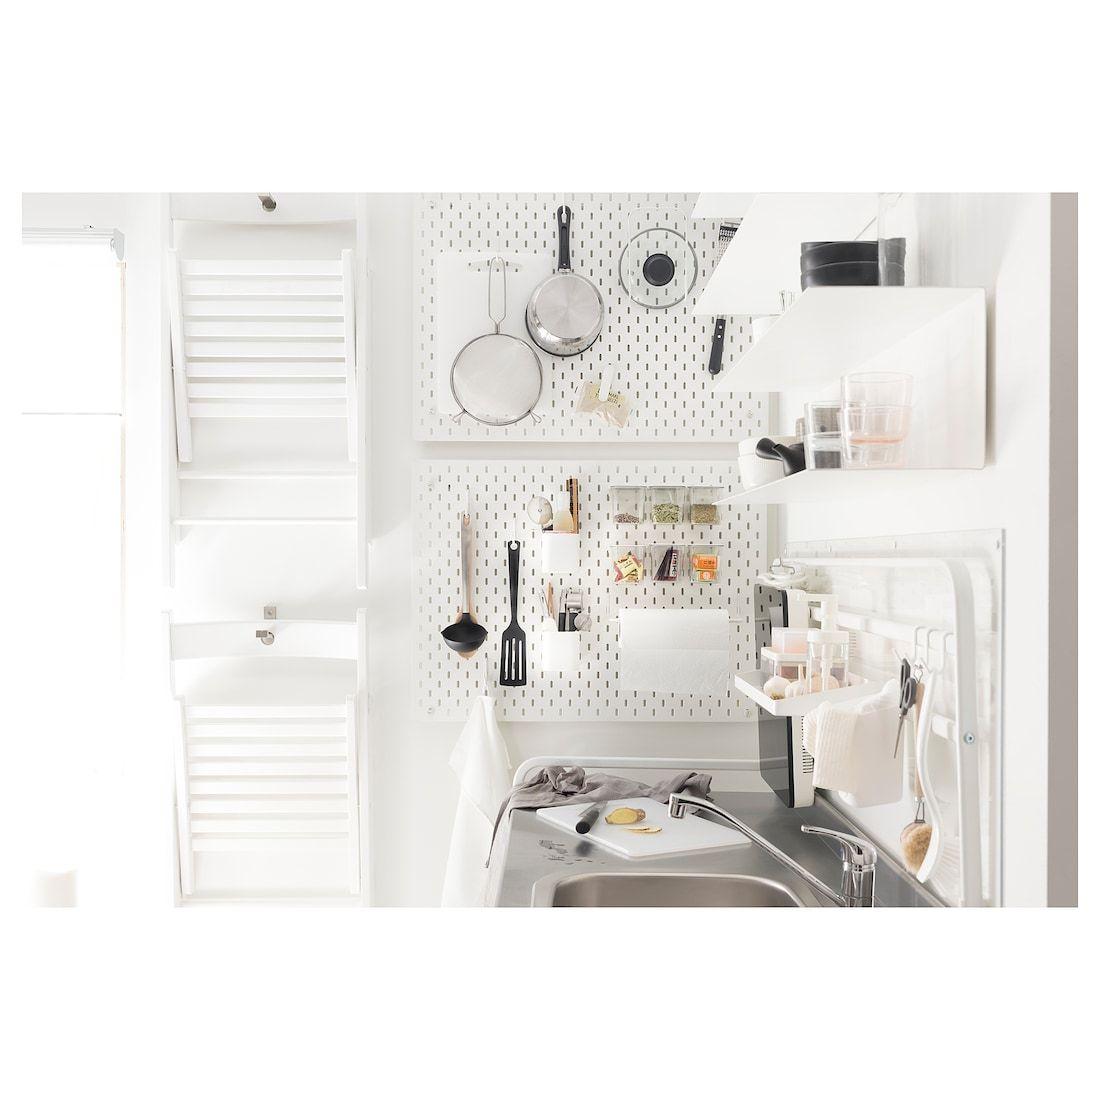 Skadis Container With Lid White Ikea In 2020 Ikea Skadis Halte Durch Wandhalter